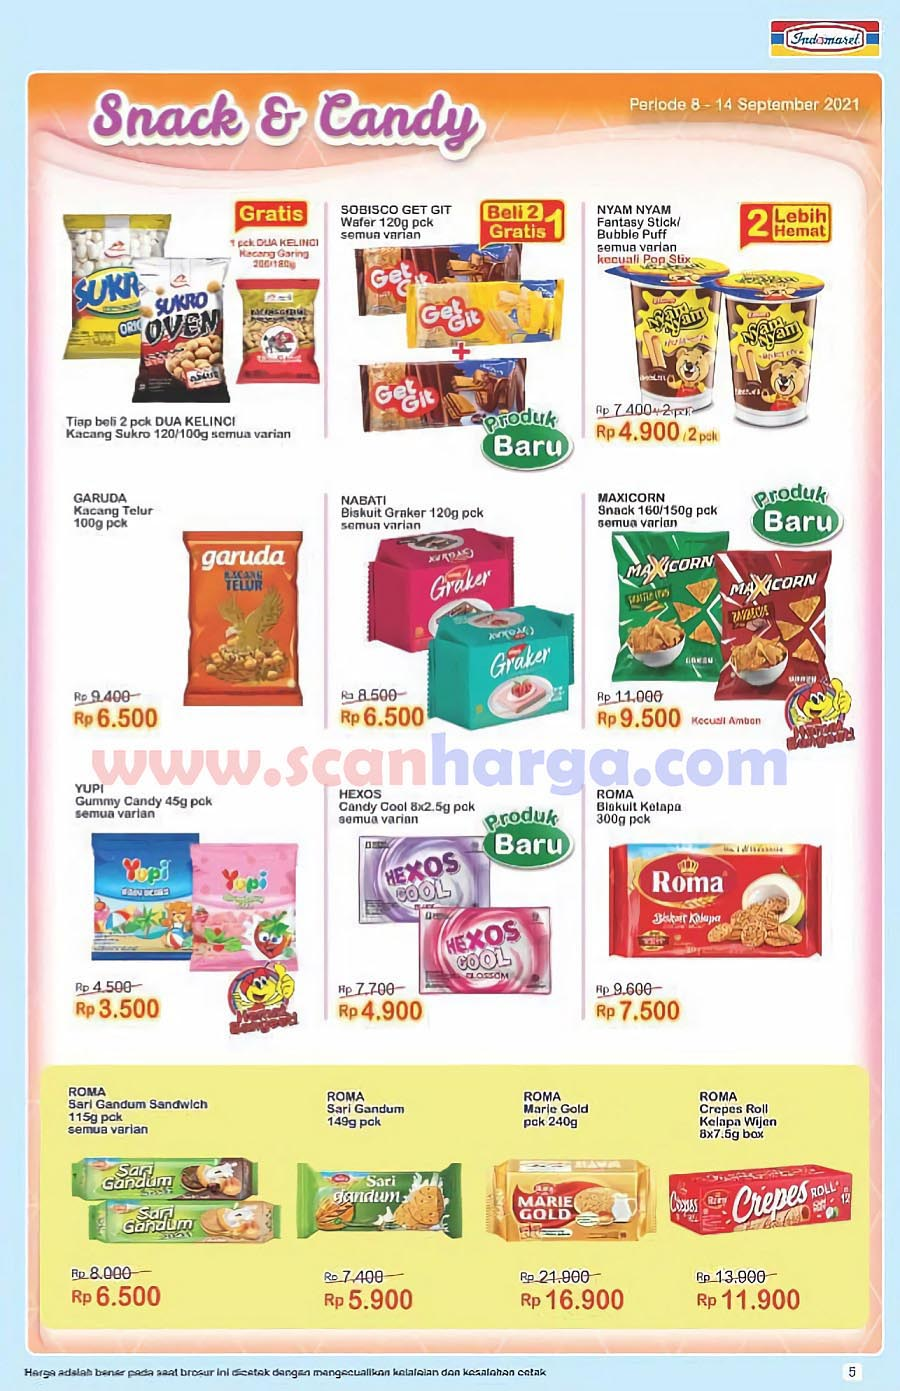 Katalog Indomaret Promo Terbaru 8 - 14 September 2021 5